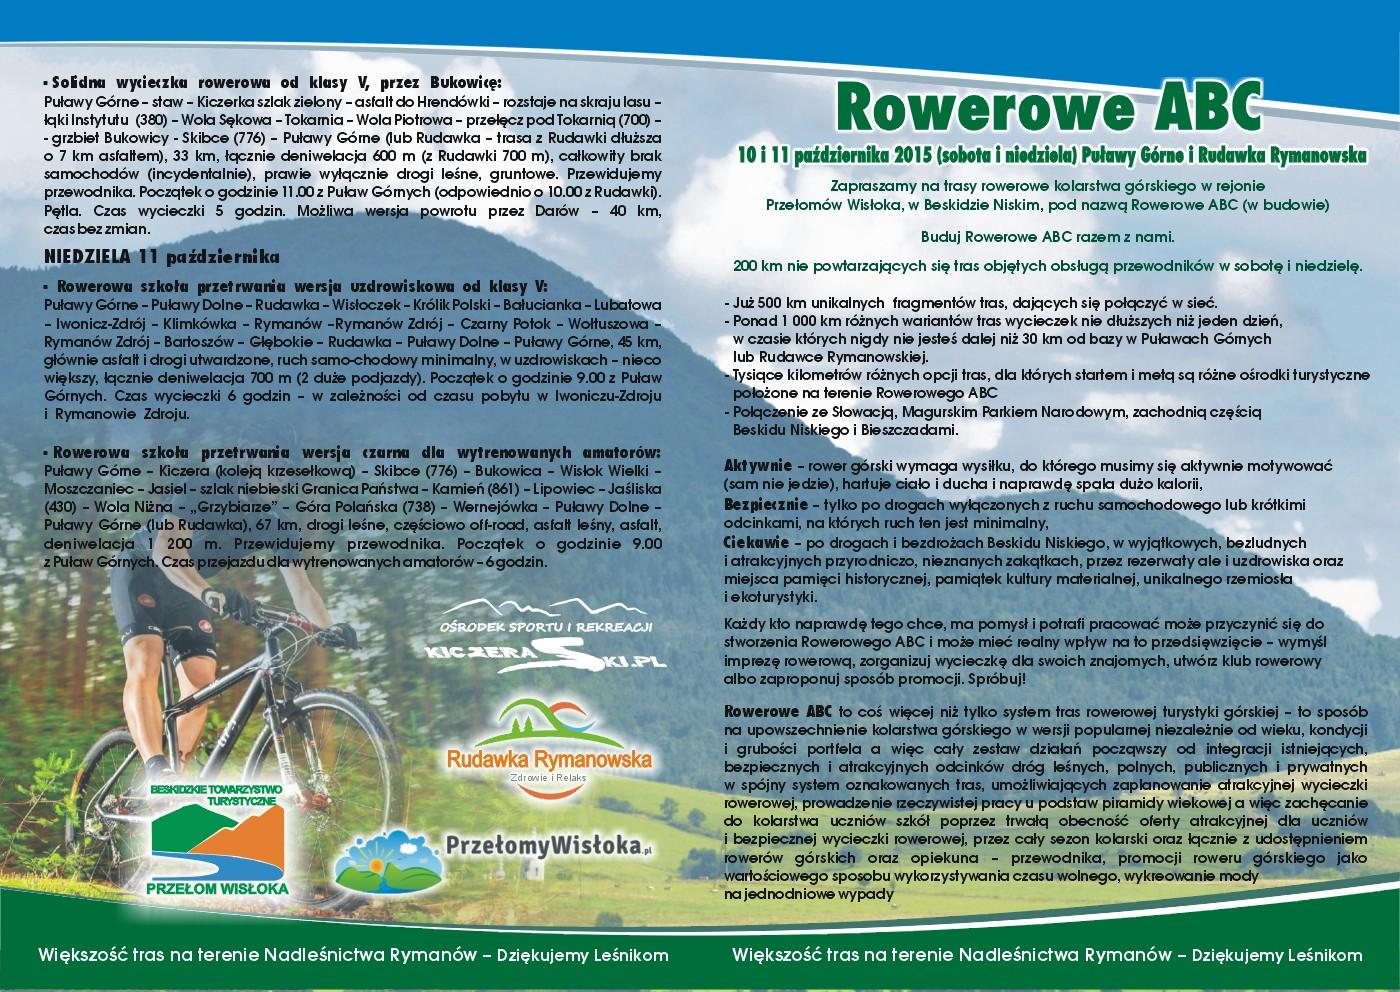 Rowerowe ABC strona 1